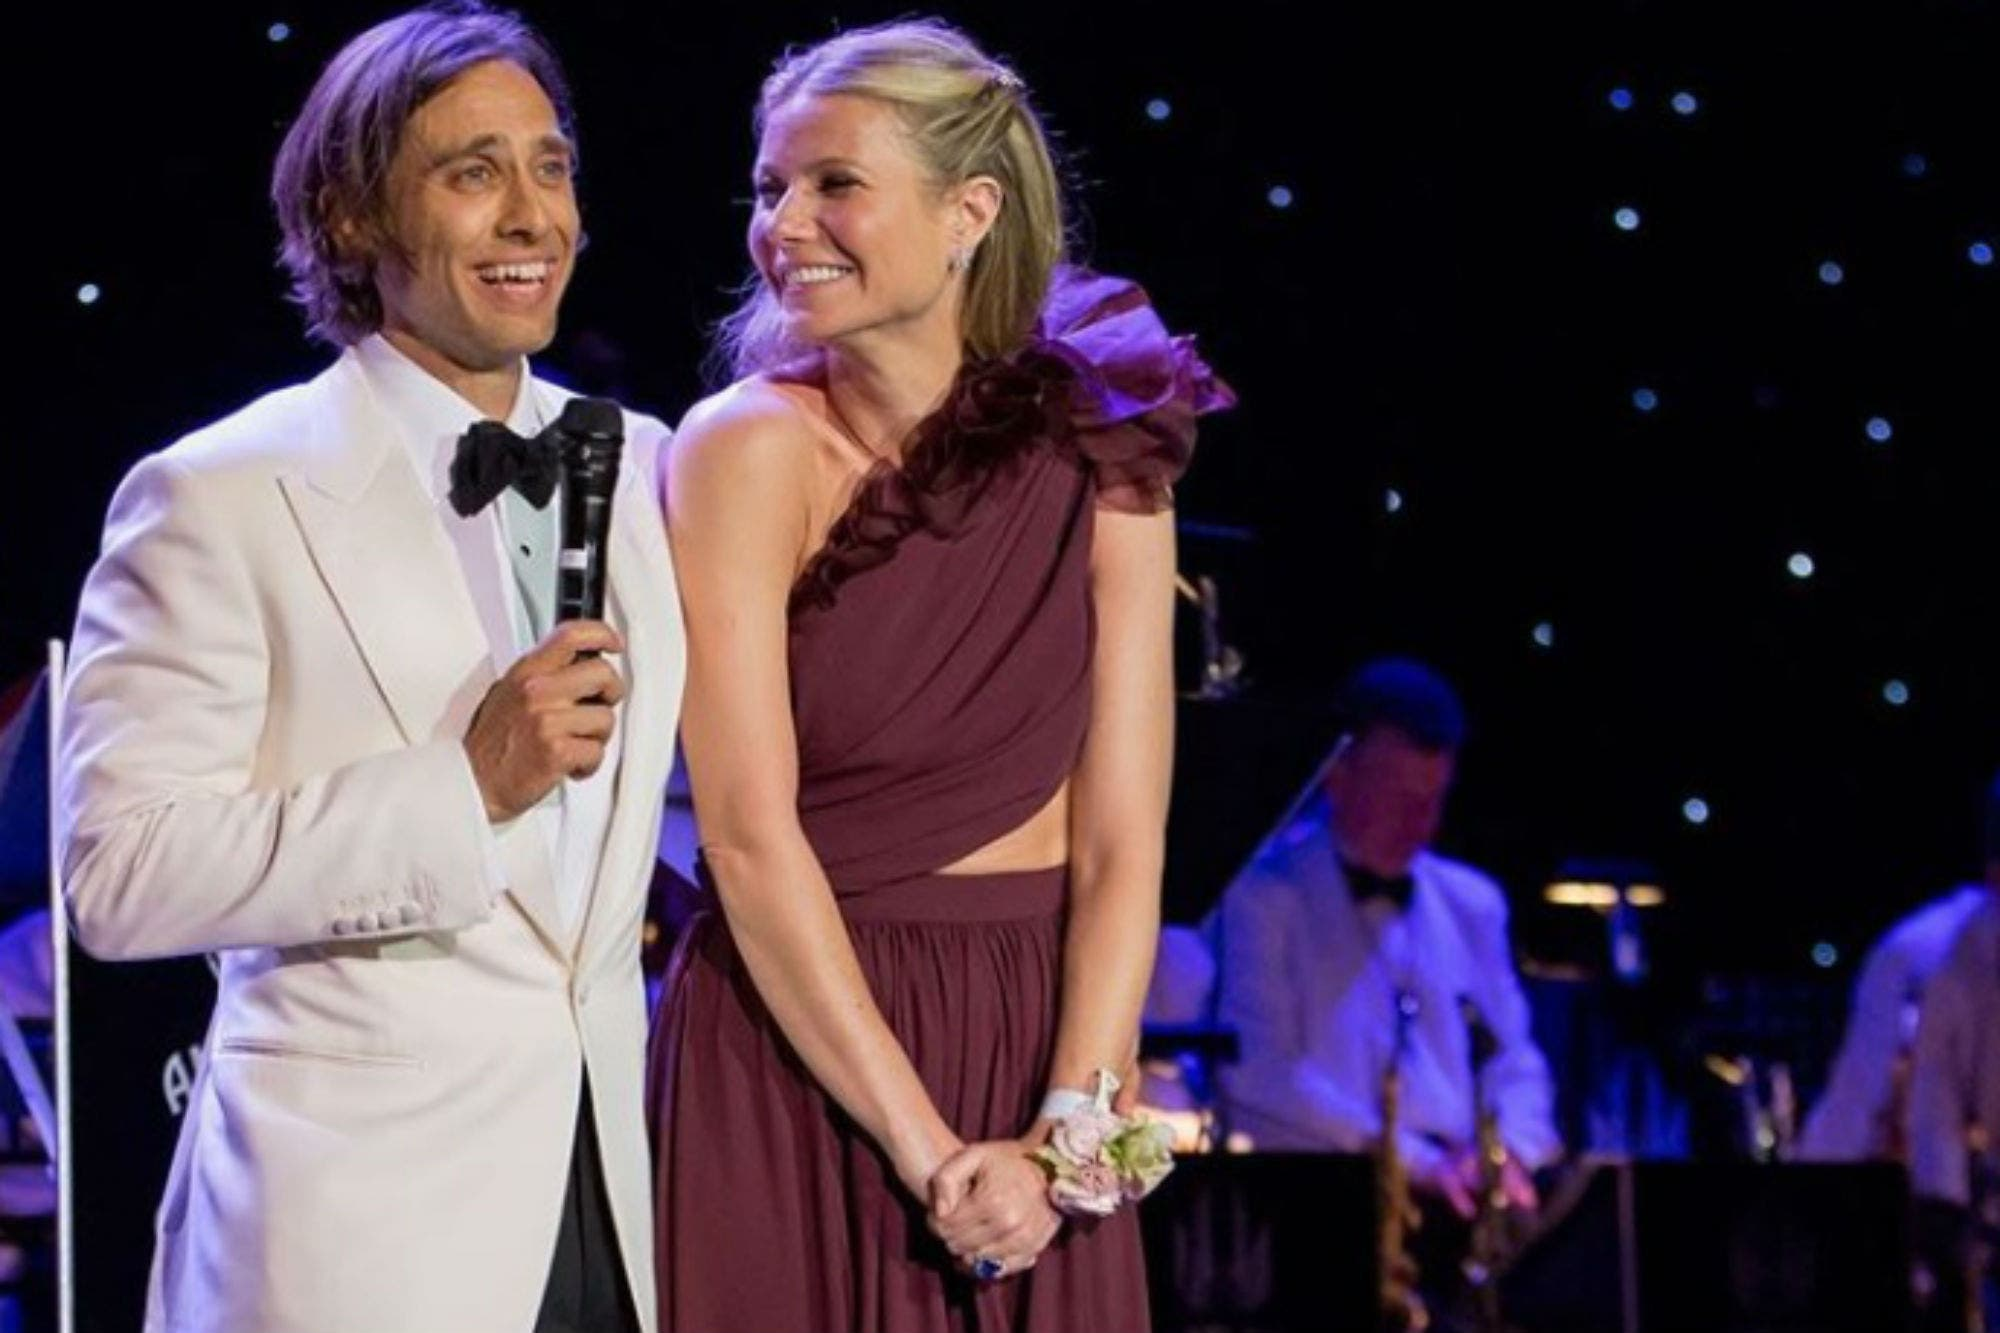 Gwyneth Paltrow y Brad Falchuk se casan este fin de semana